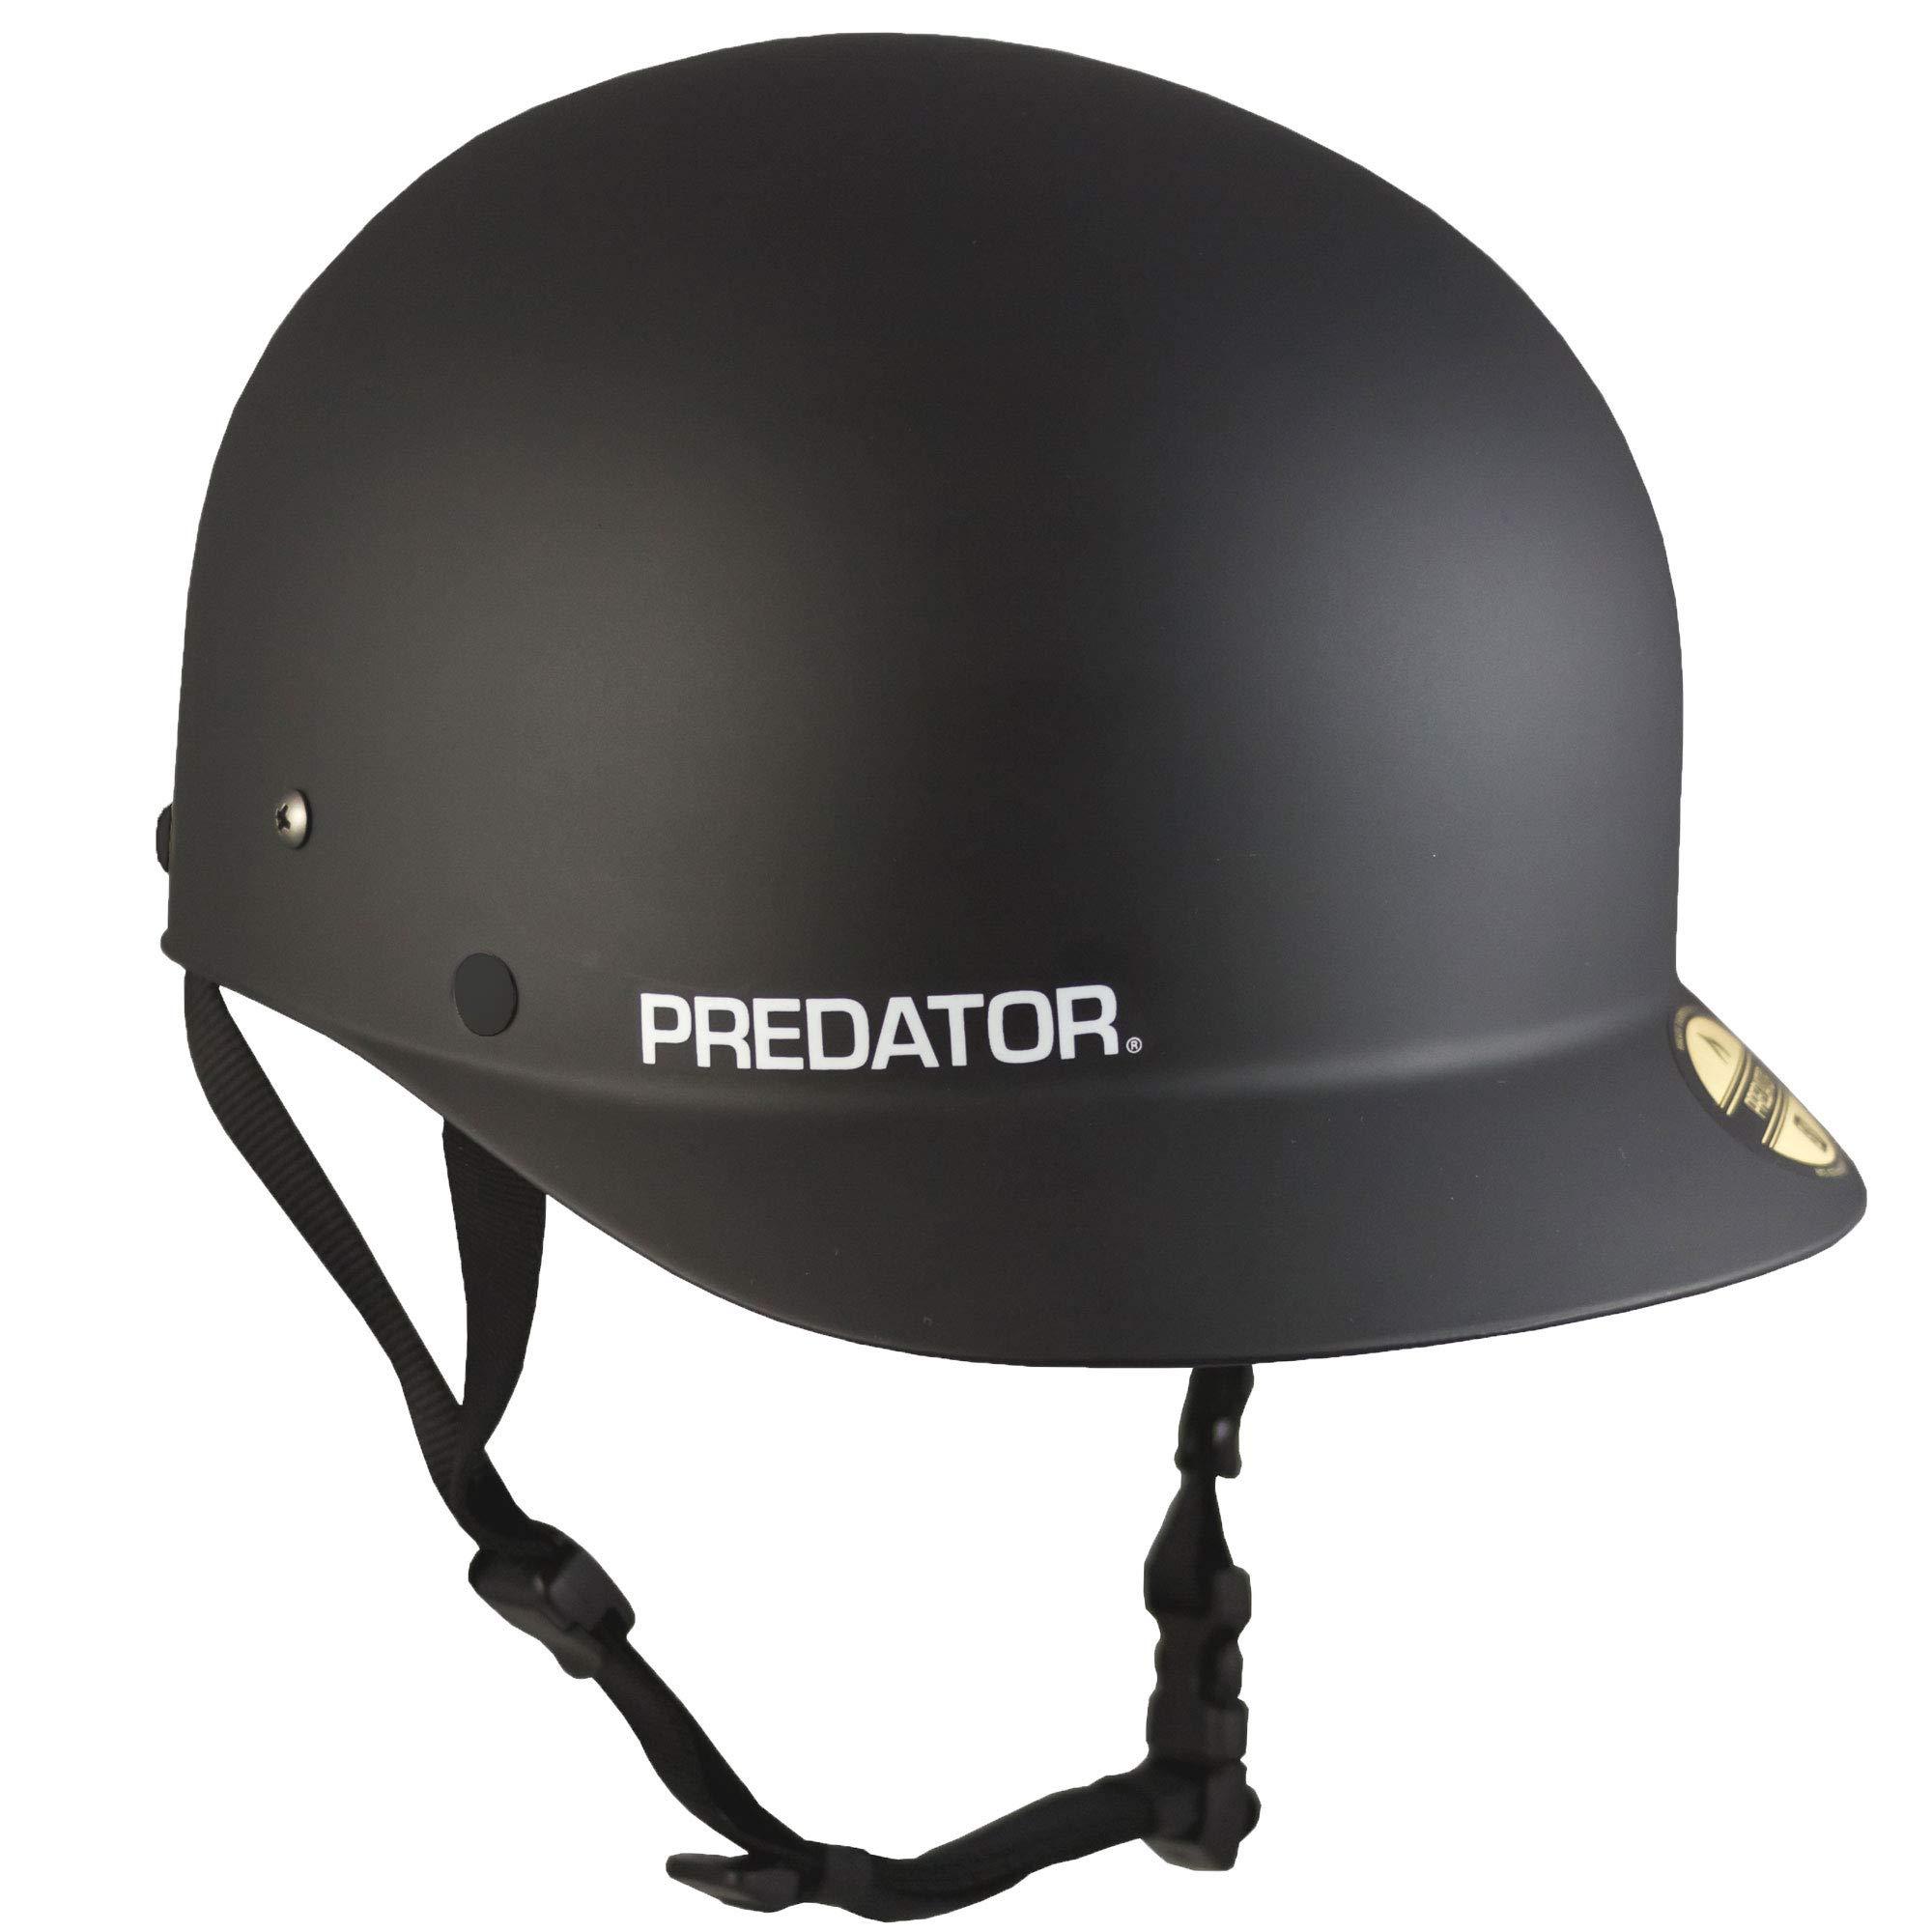 Predator Shiznit Kayak Helmet-MatteBlack-S/M by Predator